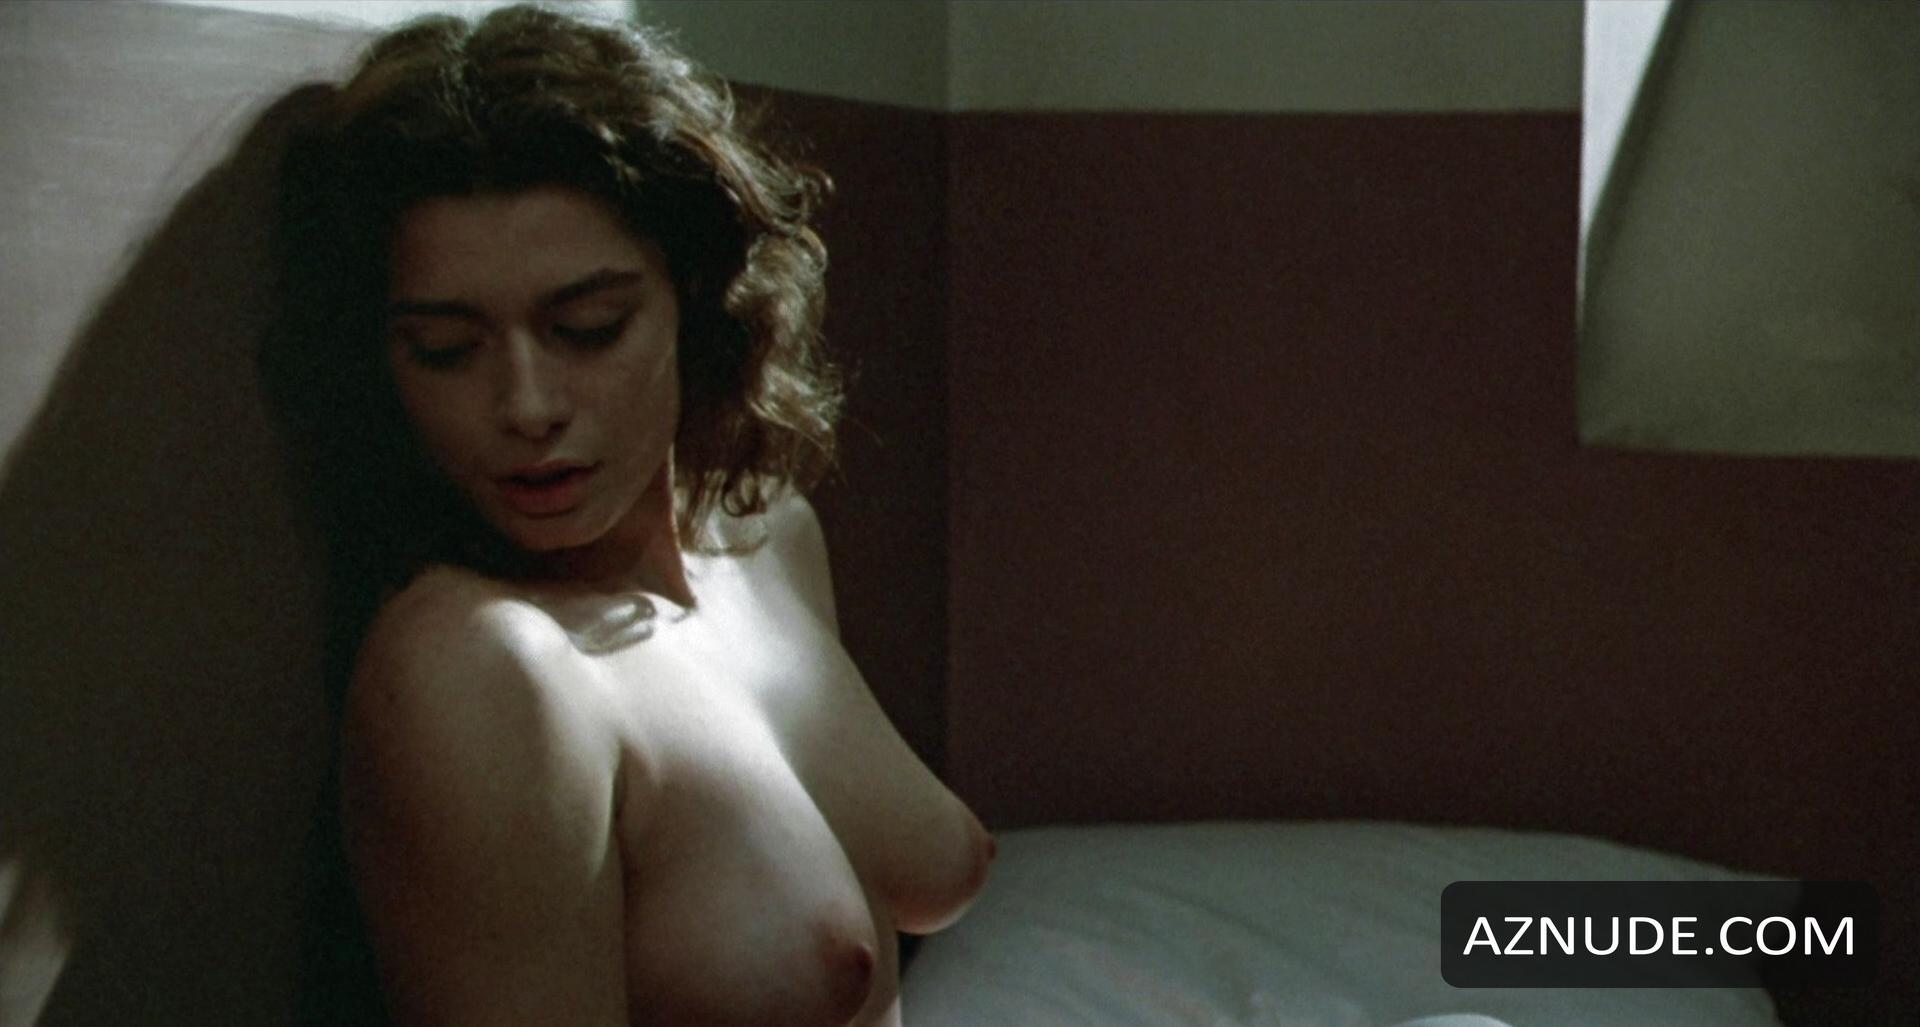 Maria romano lorraine de sellenude 1983 2